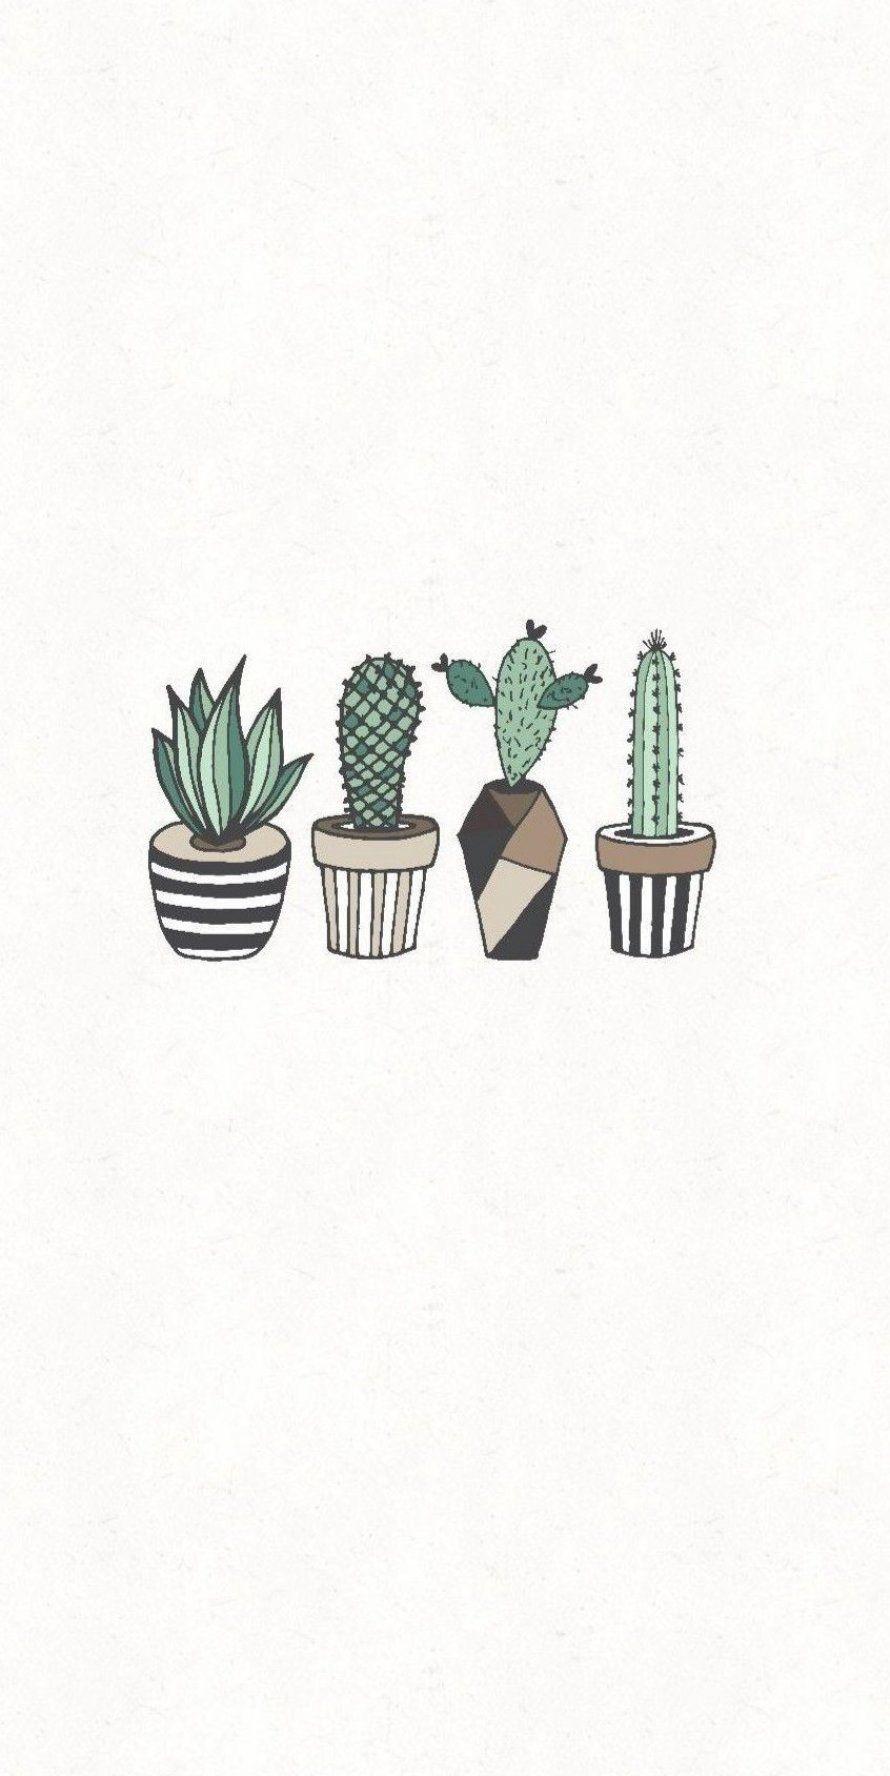 Pin By Bar Chaprac On My Pretty Nice Board Minimalist Wallpaper Cactus Drawing Plant Wallpaper